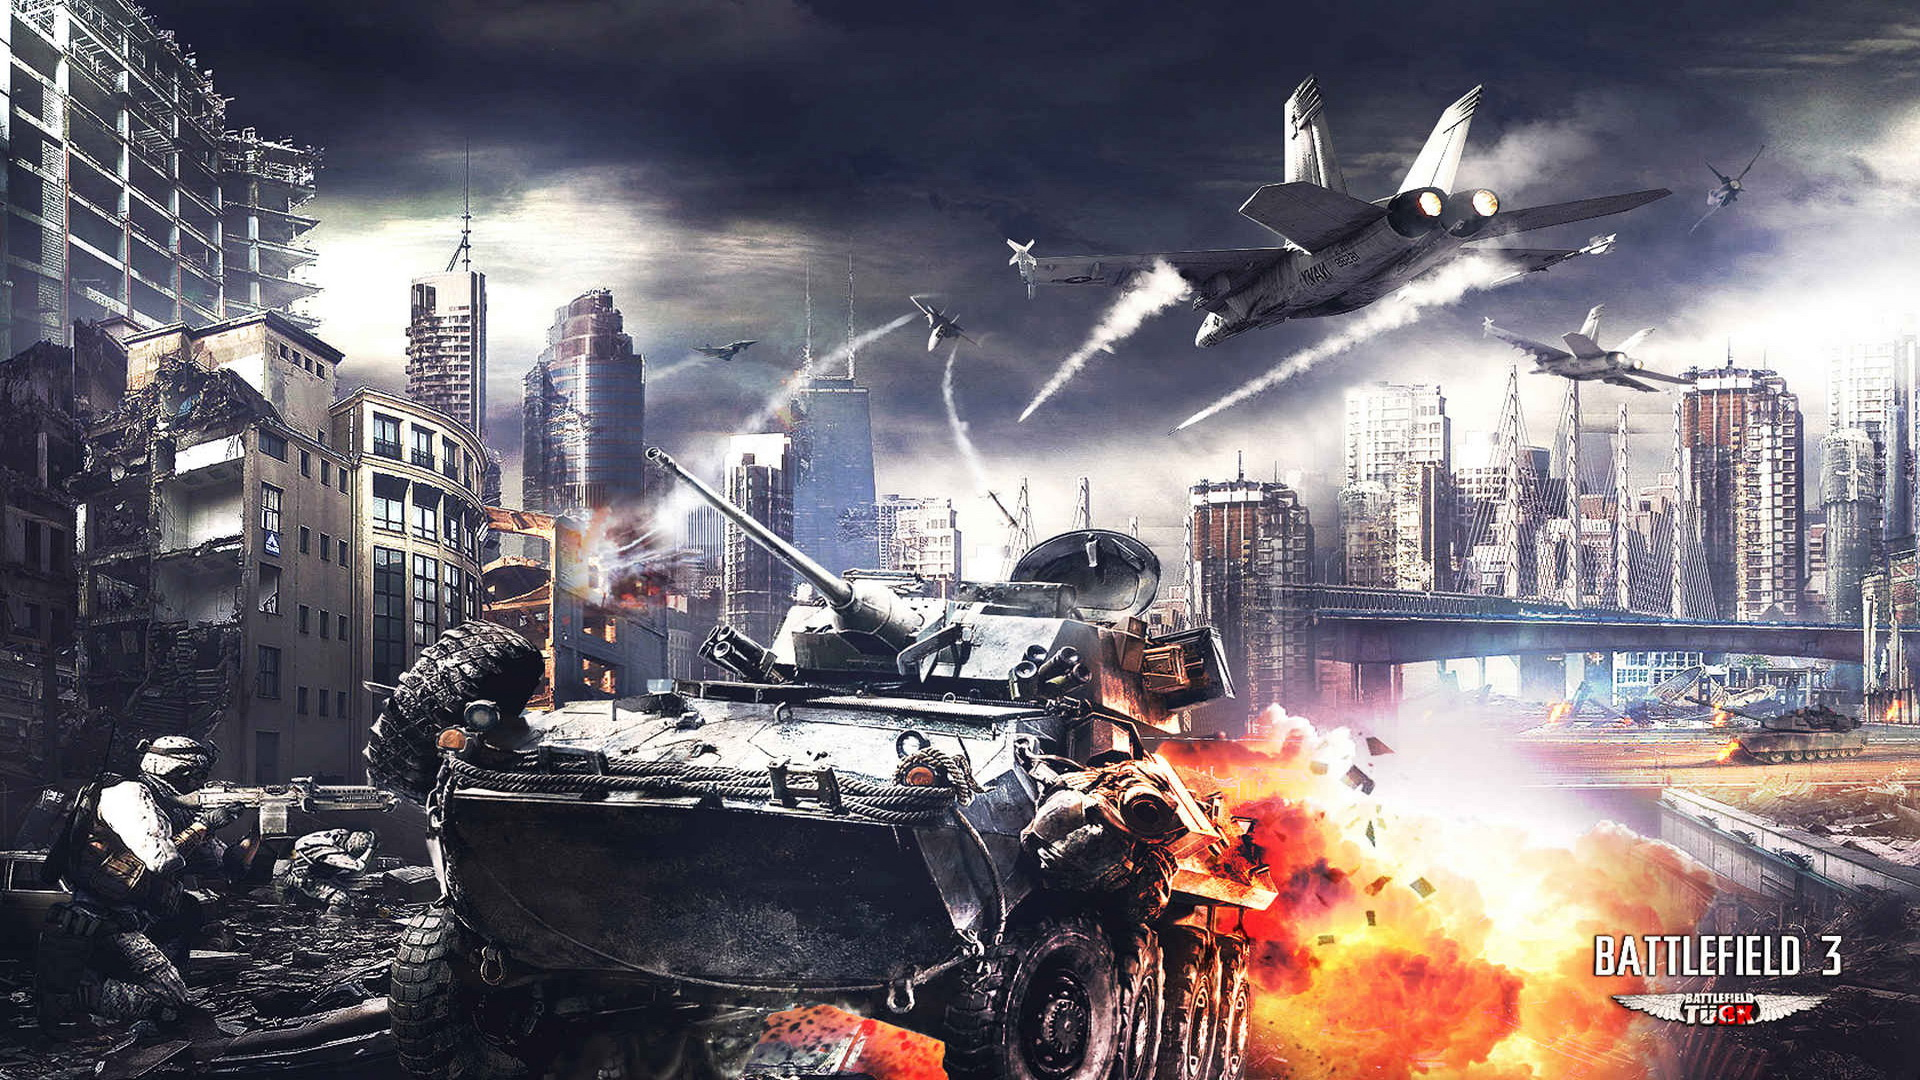 1920x1080px Battlefield 4 1080p Wallpaper Wallpapersafari